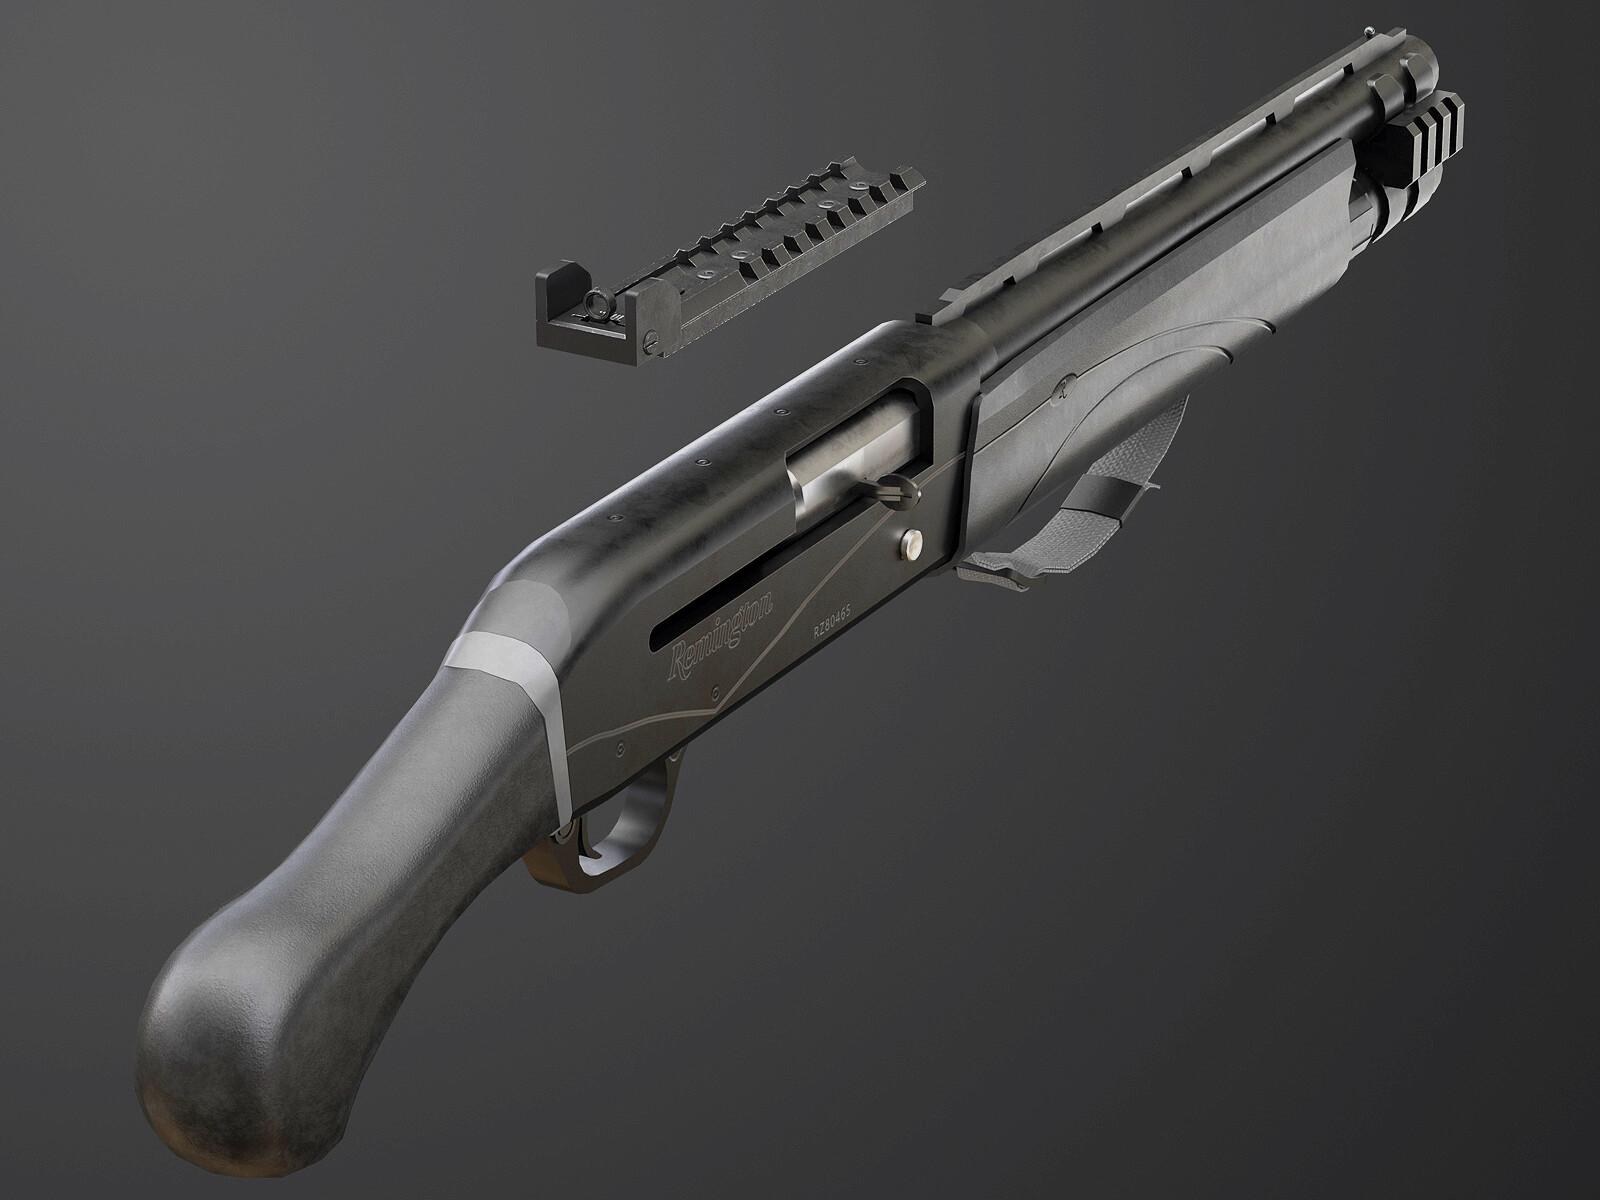 ArtStation - Remington V3 Tac-13, Gökhan Öz